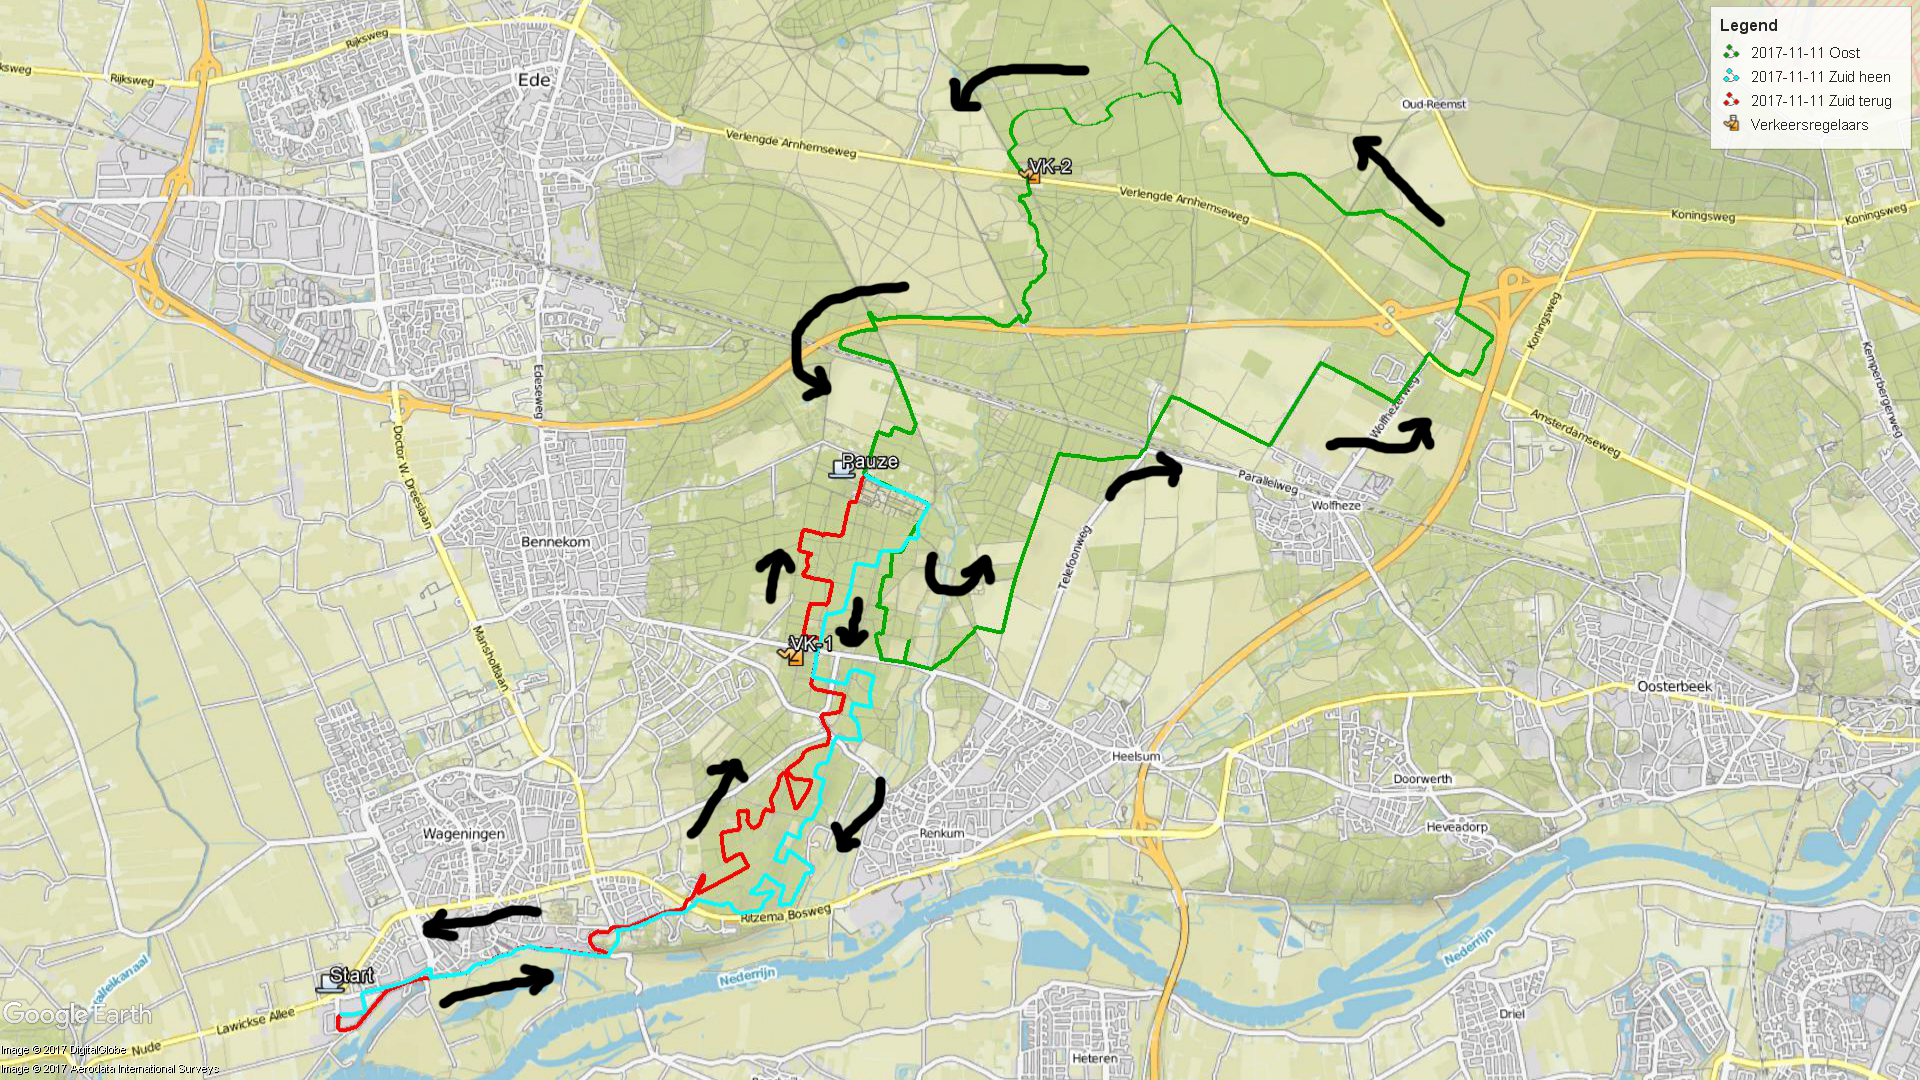 http://www.tcw79.nl/sites/default/files/public/routes/2017WT2%20kaart%20met%20richting.png